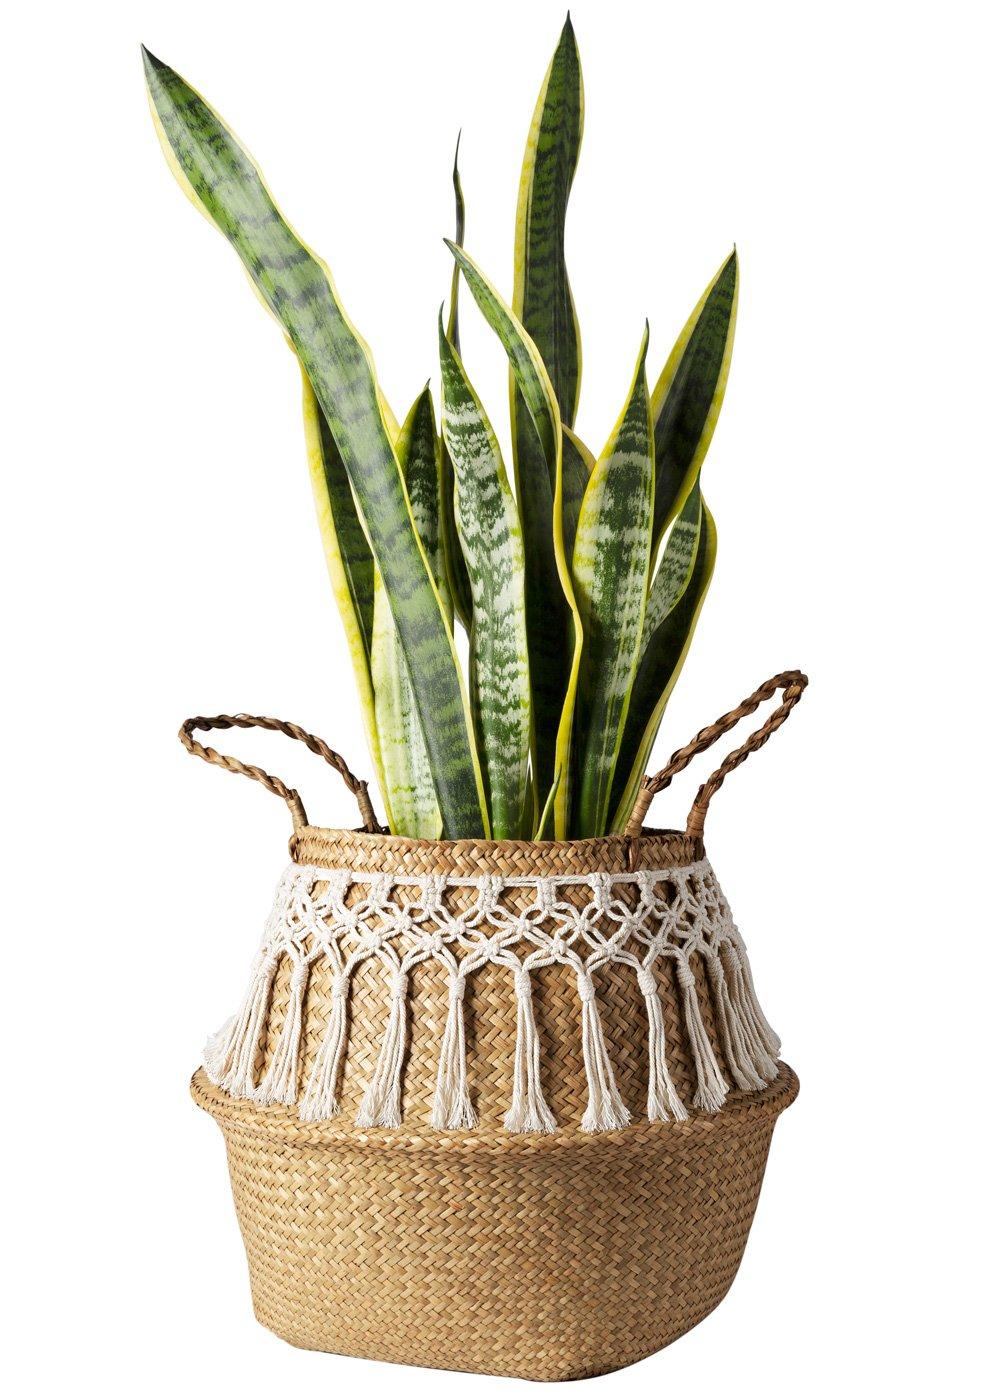 Mkono 2 Pcs Seagrass Belly Basket Plant Pot Cover Laundry Storage Toy Organizer with Macrame Wrap